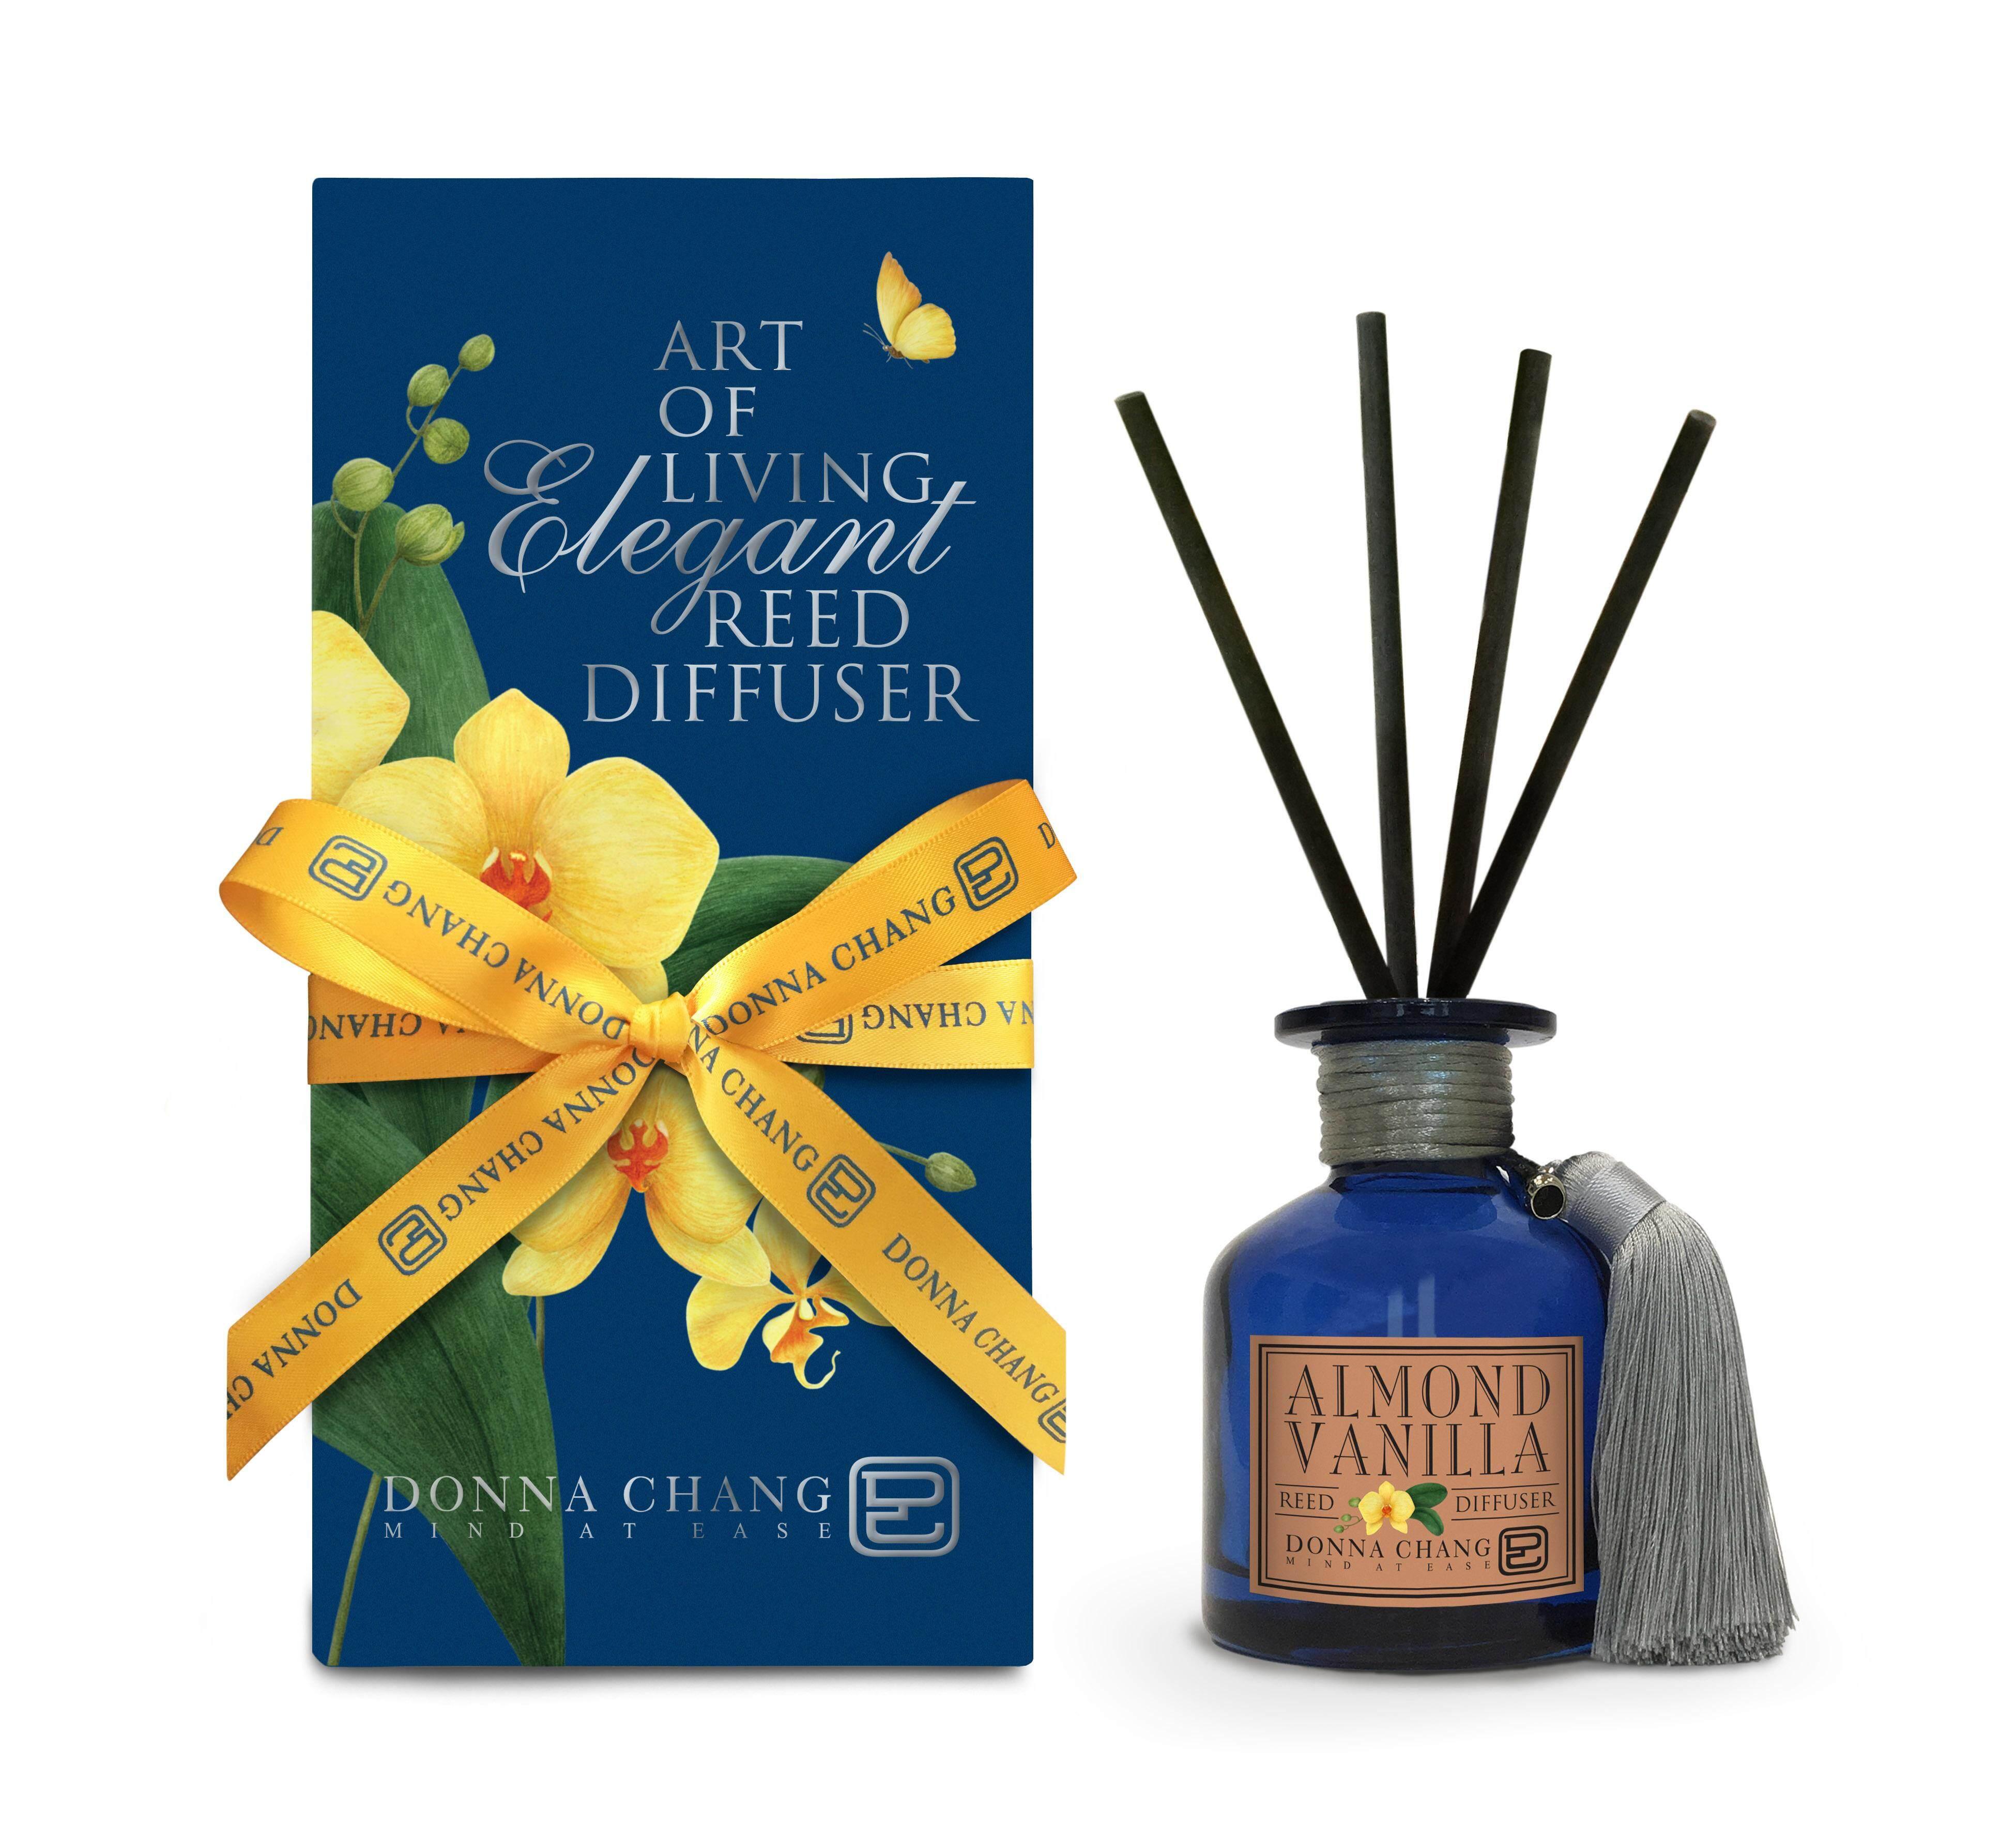 Donna Chang ชุดก้านไม้หอมปรับอากาศ Reed Diffuser กลิ่น Almond Vanilla 100 Ml..